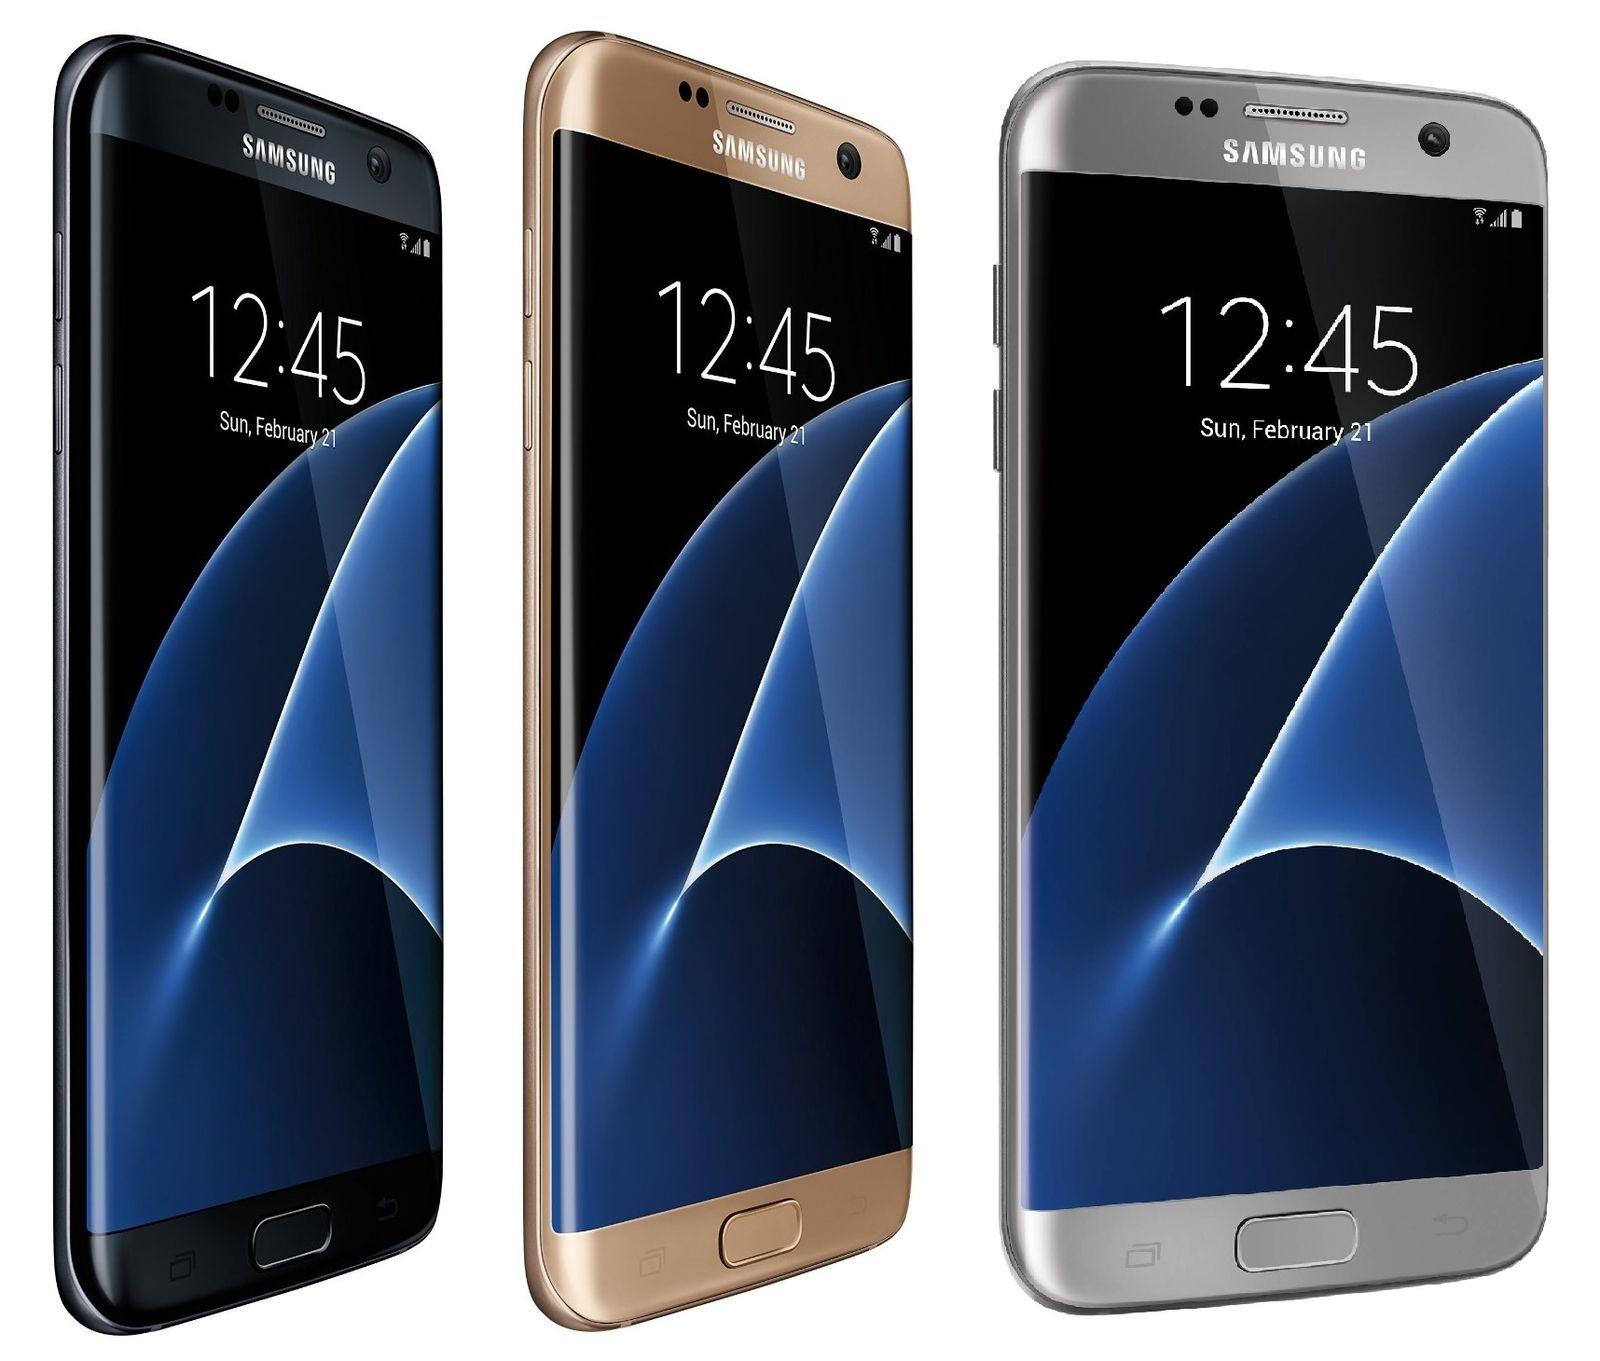 8b75ffb08c92b Samsung Galaxy S7 Edge G935 32GB Verizon + Factory GSM Unlocked ...